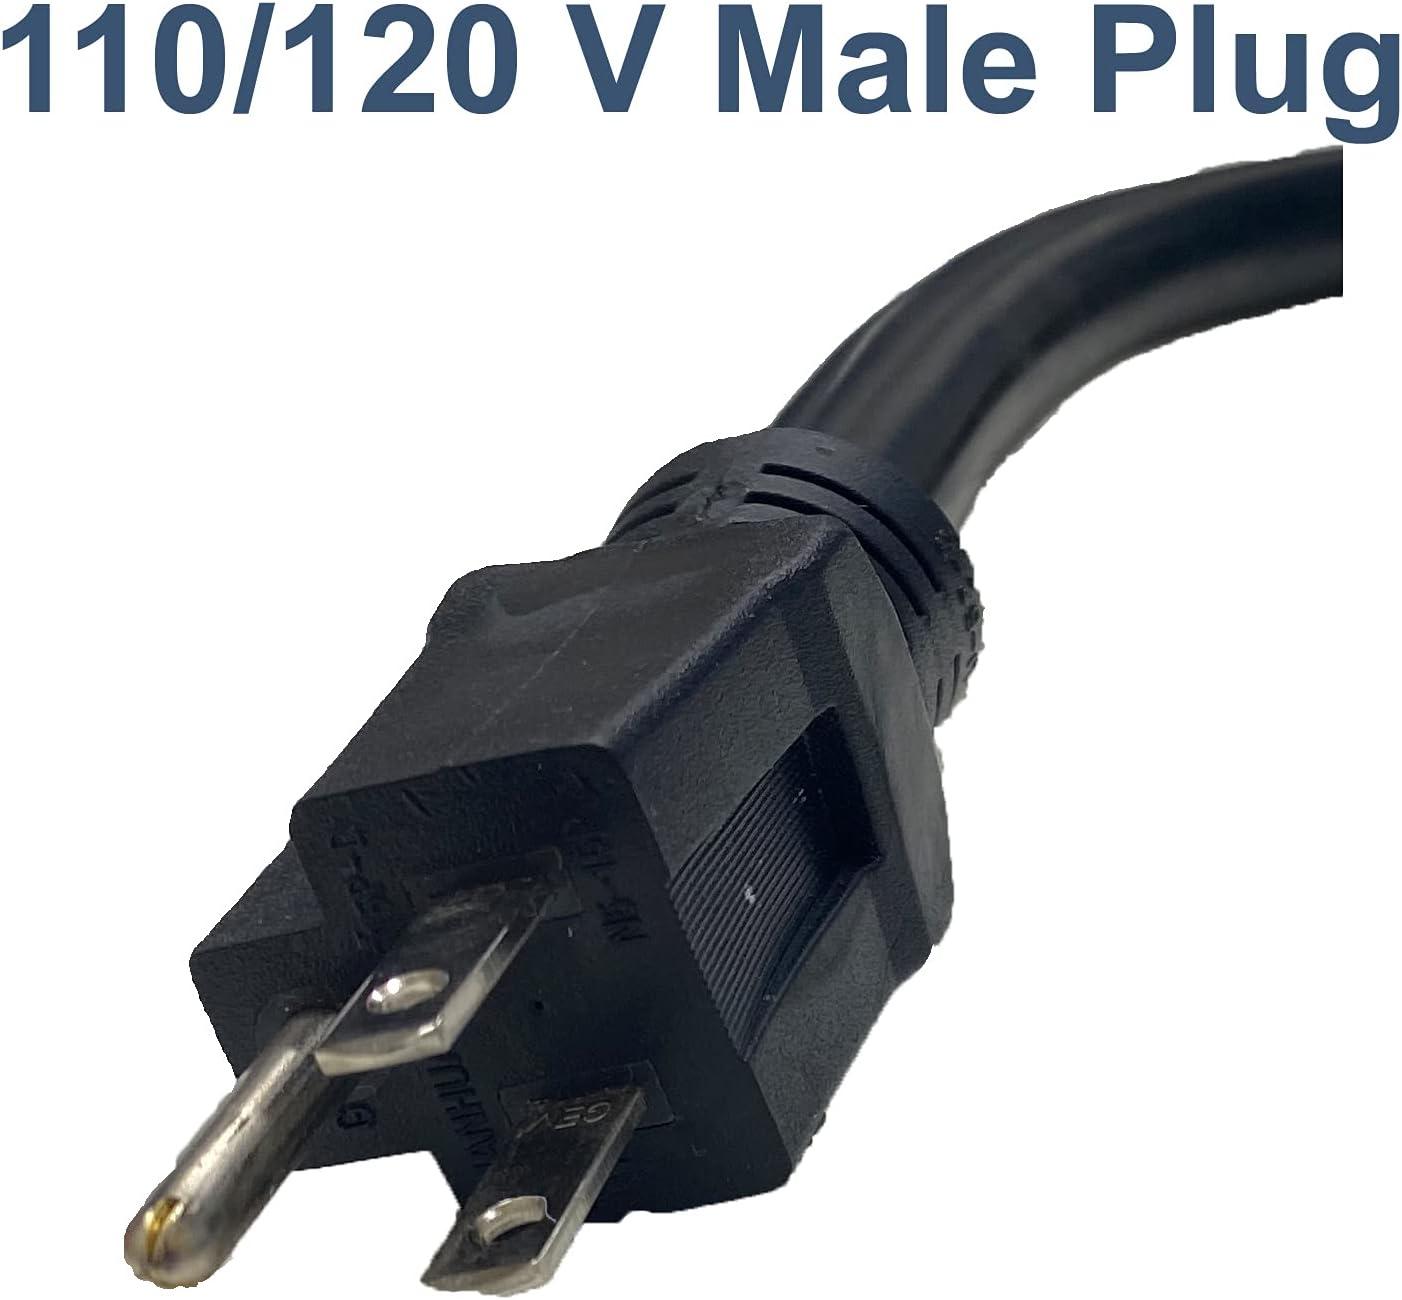 LOTOS PT01 Pigtail Type 1, Convert 220V to 110V for LT5000D/LTP5000D/LTPDC2000D/CT520D, Blue (520D, Black: Tools & Home Improvement